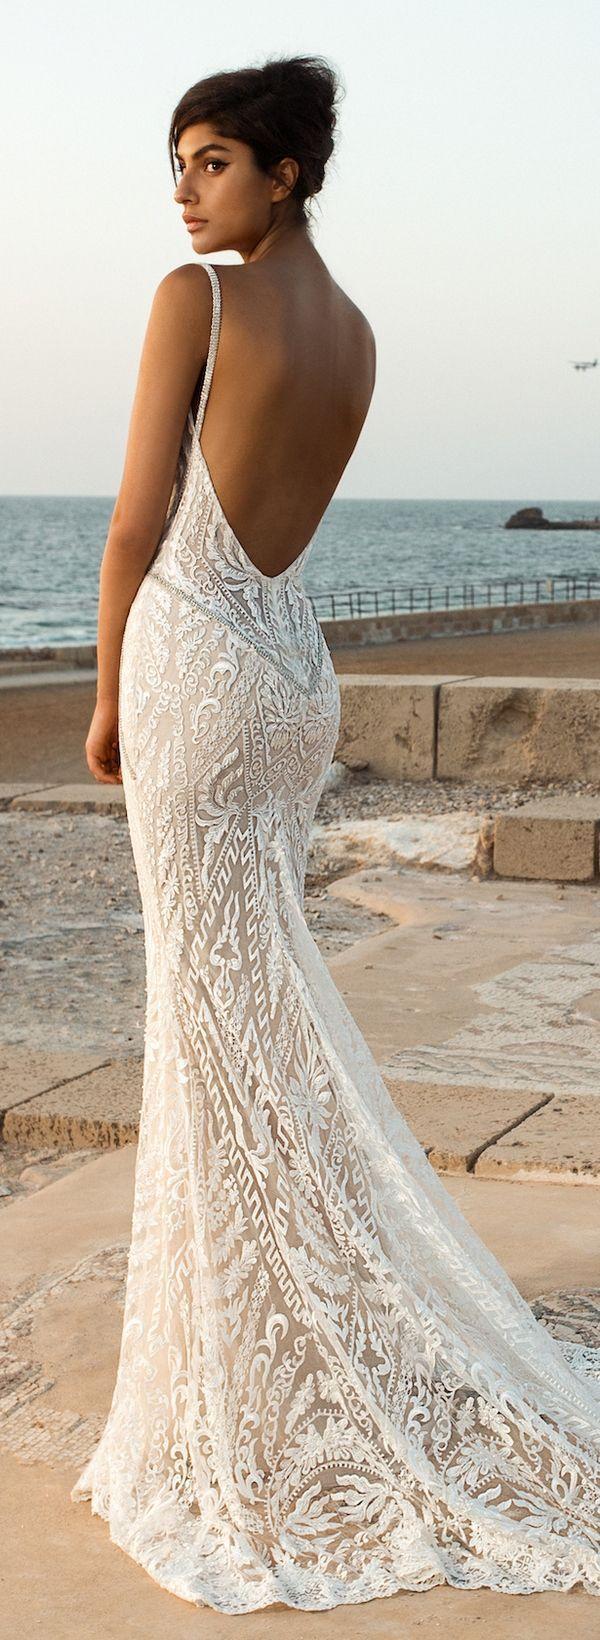 2 piece crop top wedding dress   best Vestidos images on Pinterest  Wedding bridesmaid dresses